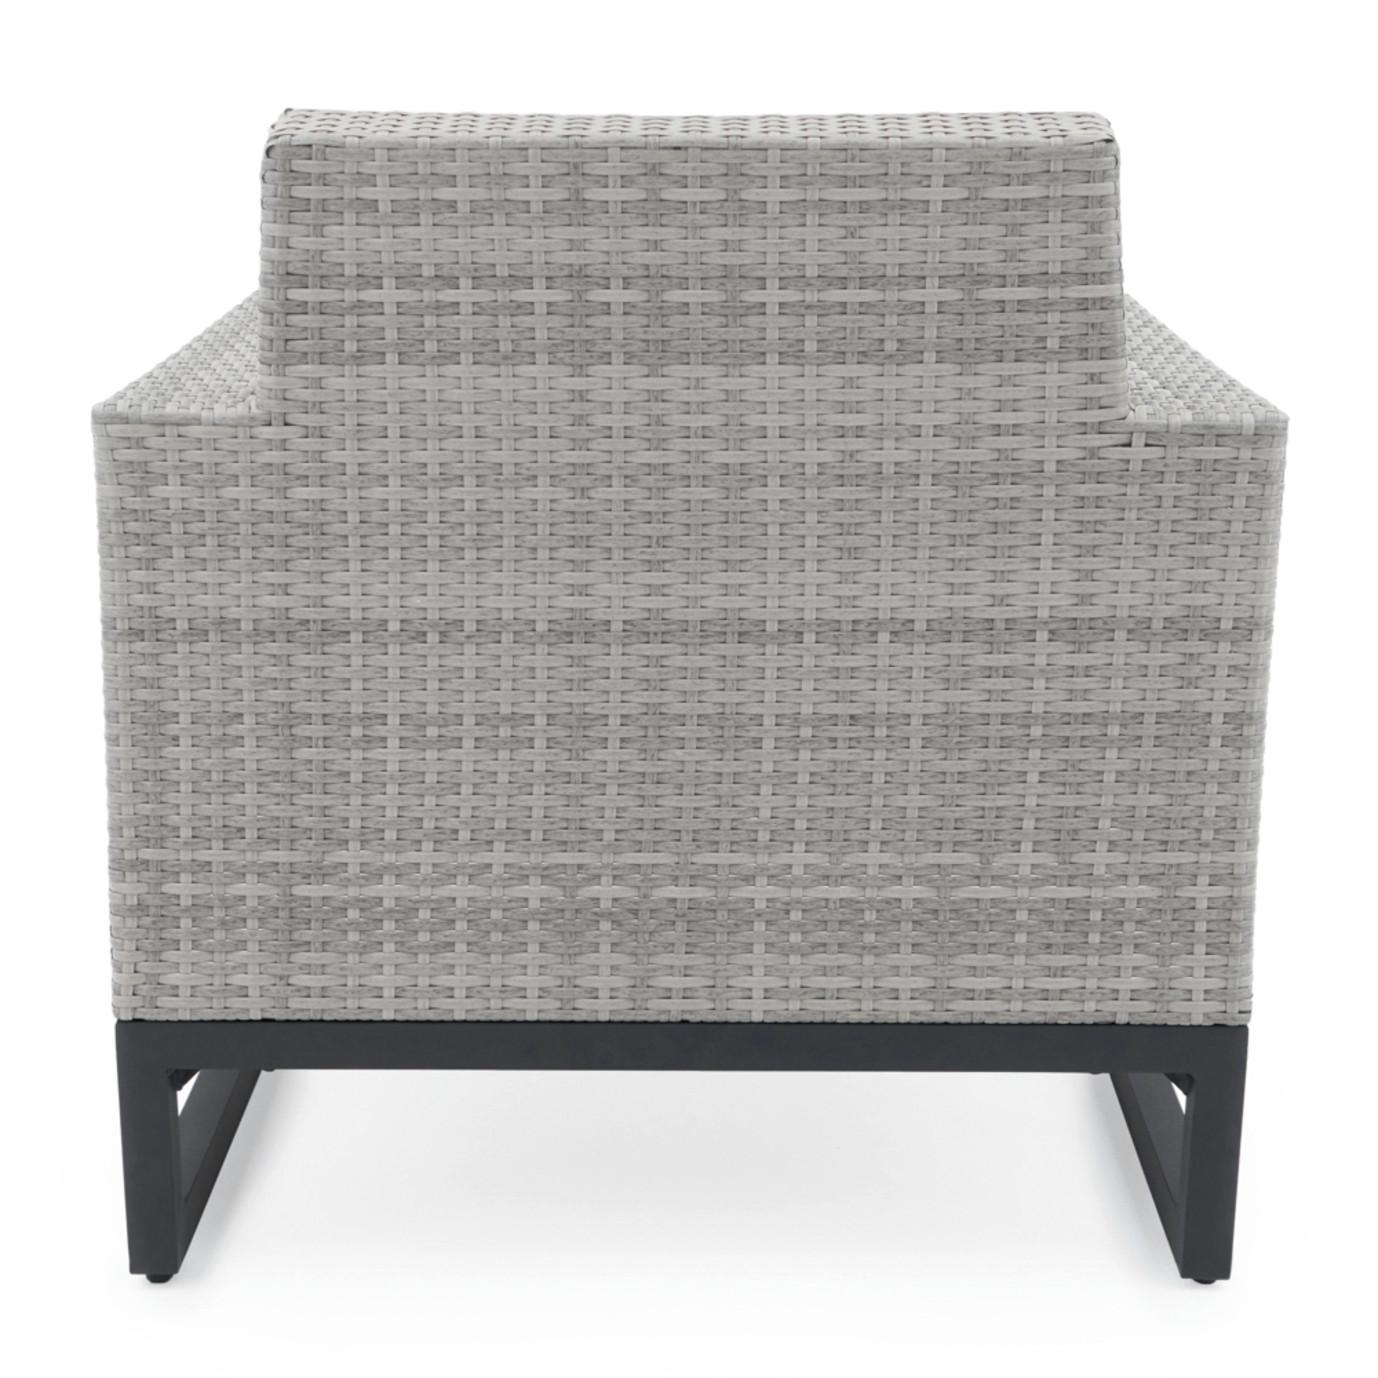 Milo™ Gray Club Chairs - Slate Gray